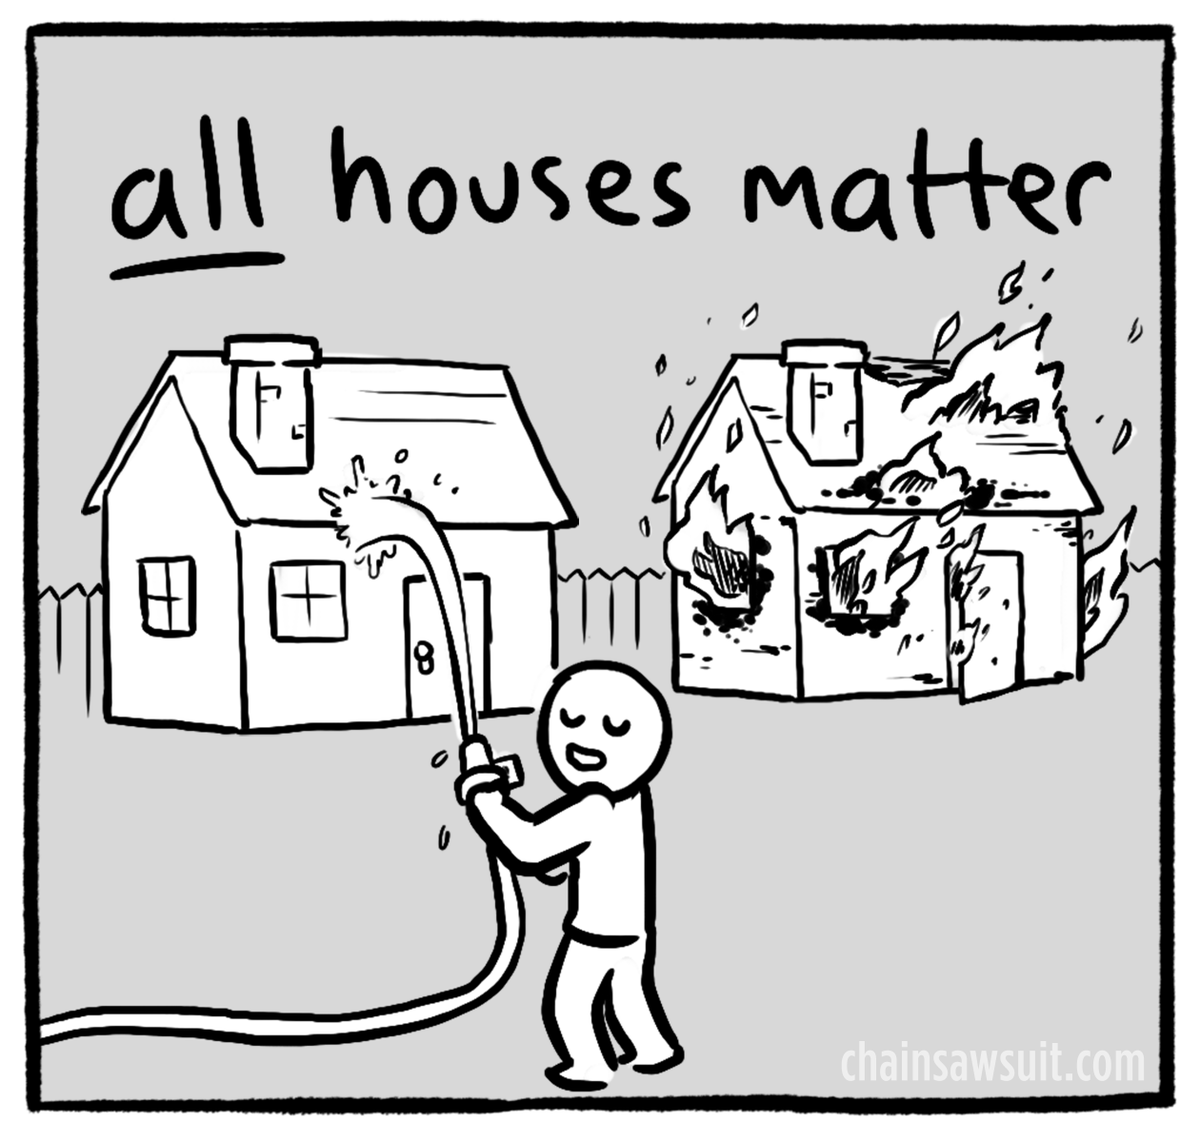 hi-res of my #allhousesmatter strips. http://t.co/cJoNYgr3Wz http://t.co/AjlUDaimKb http://t.co/Bg1RcSzwTJ